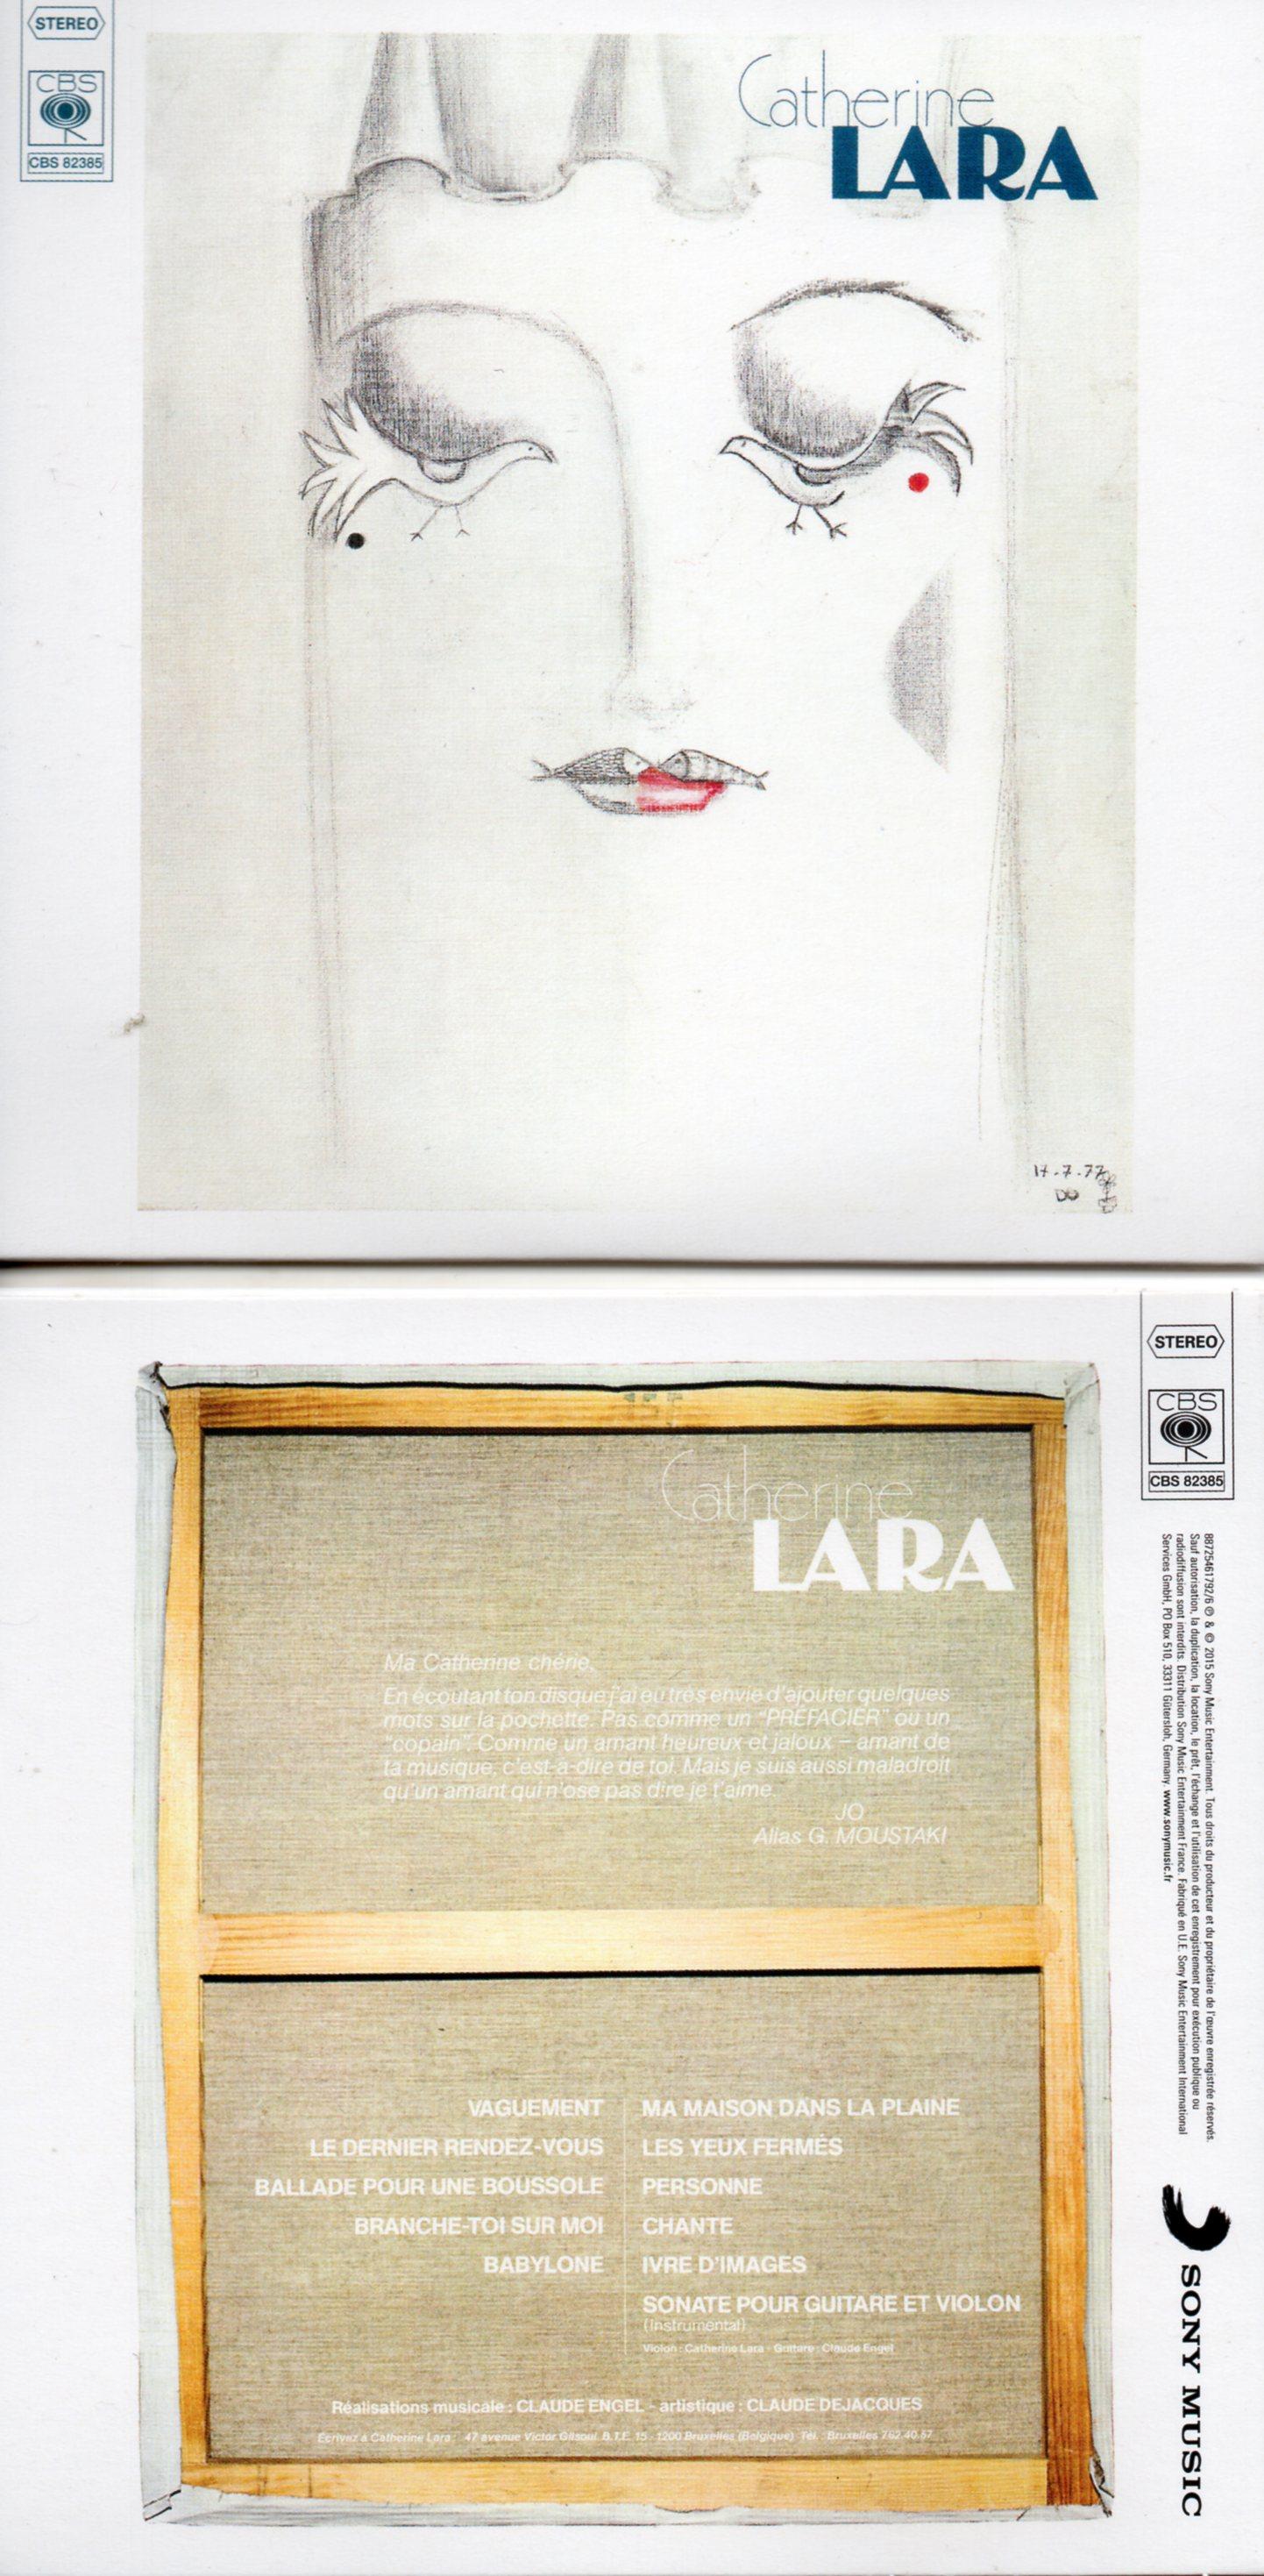 CATHERINE LARA - Vaguement - MINI LP REPLICA - 11-TRACK CARD SLEEVE - Pochette Cartonnée - CD